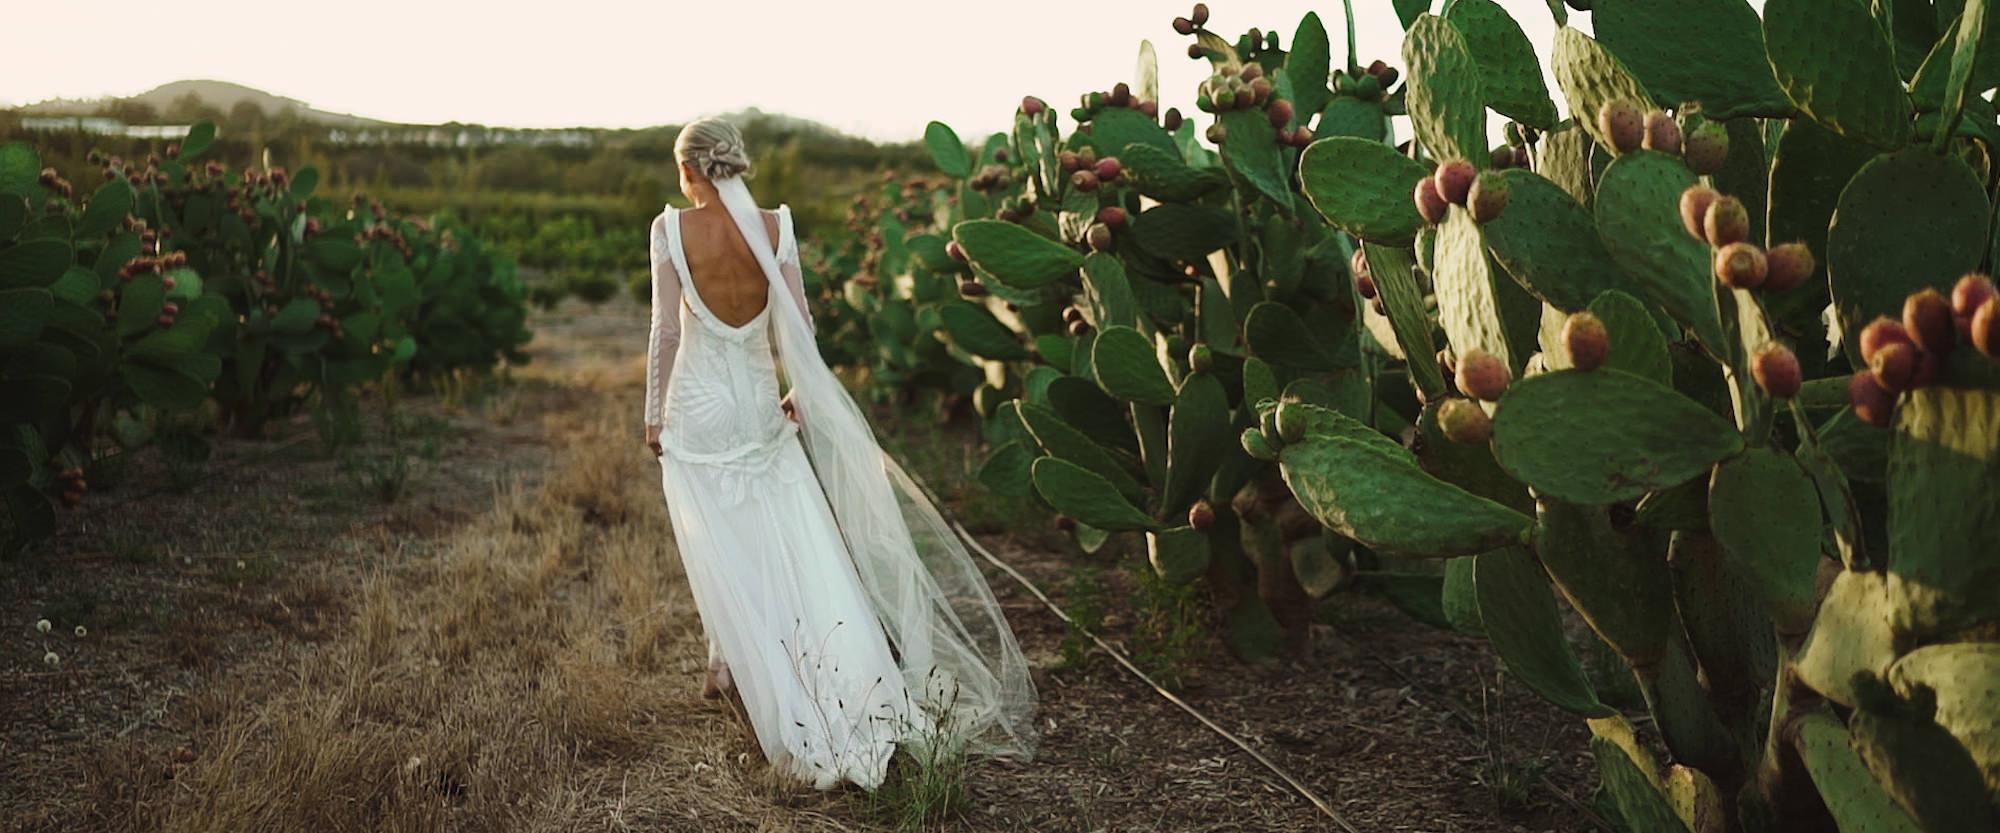 HeathEmelieWeddingFilm_Babylonstoren_Wedding_9.jpg